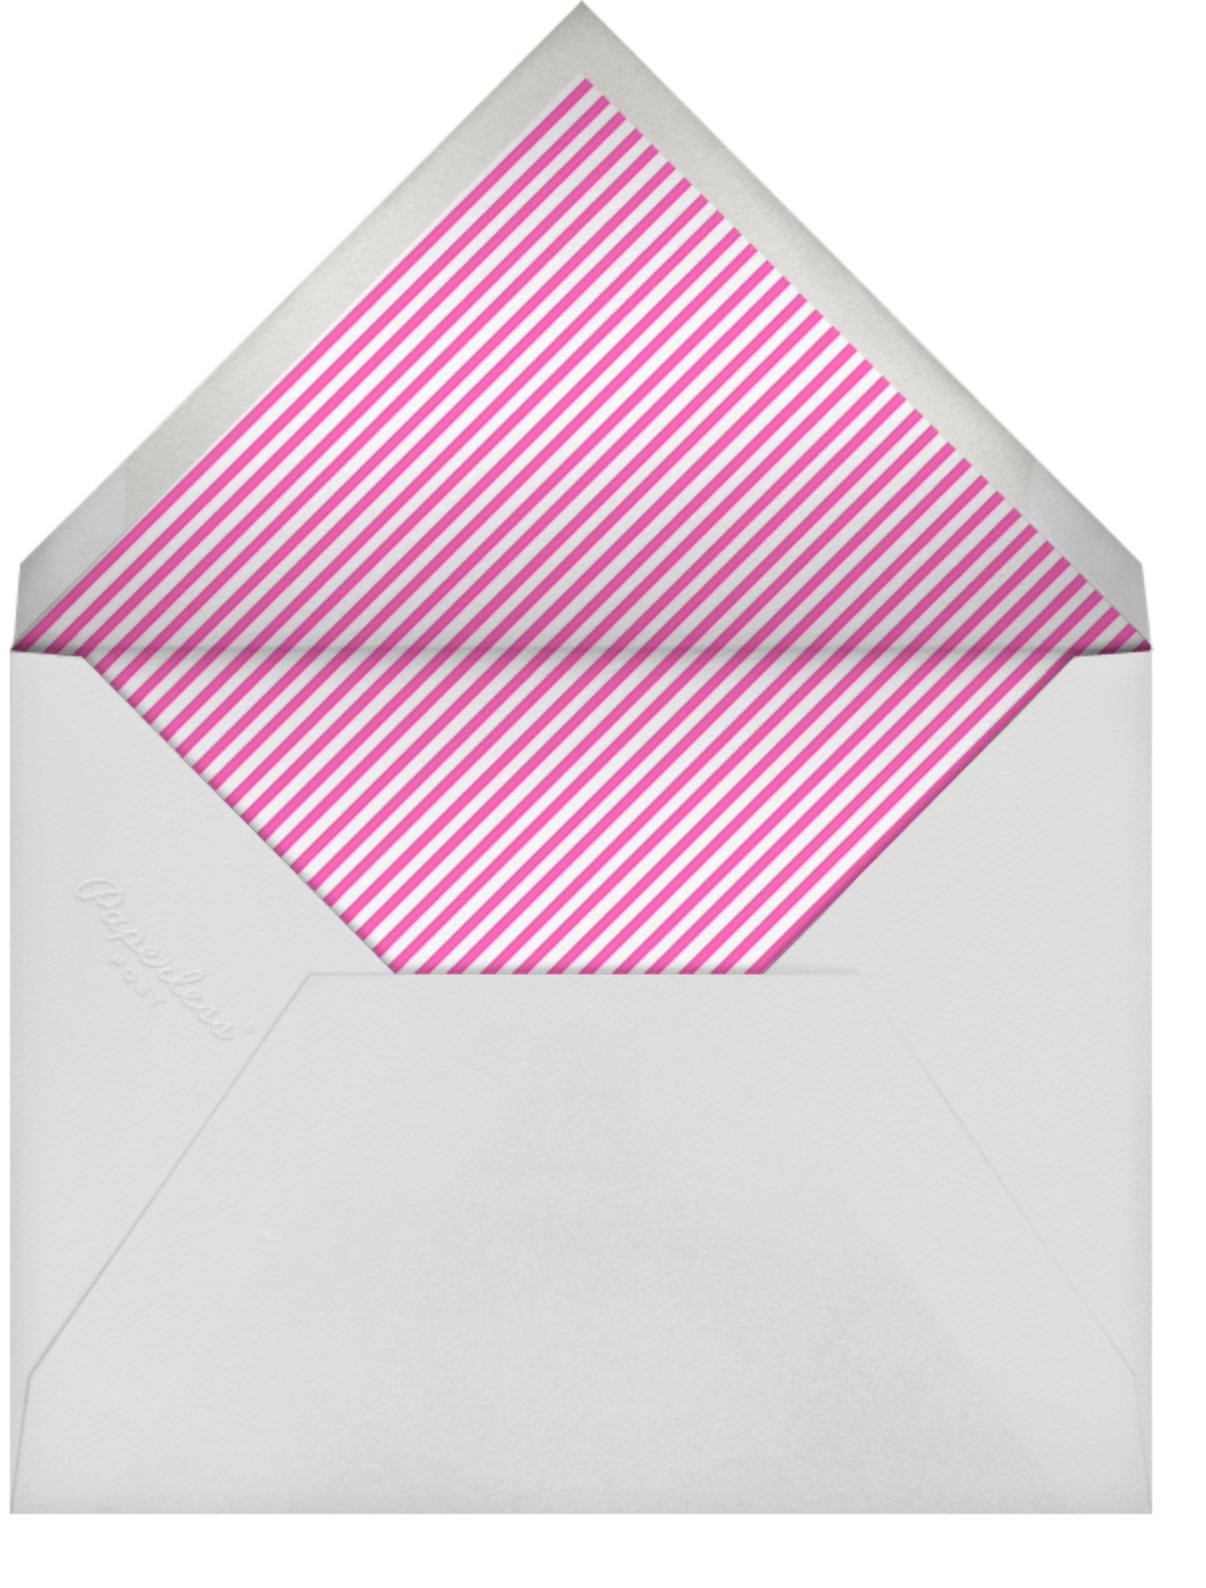 Stripe Border - Schiaparelli - Paperless Post - Charity and fundraiser  - envelope back